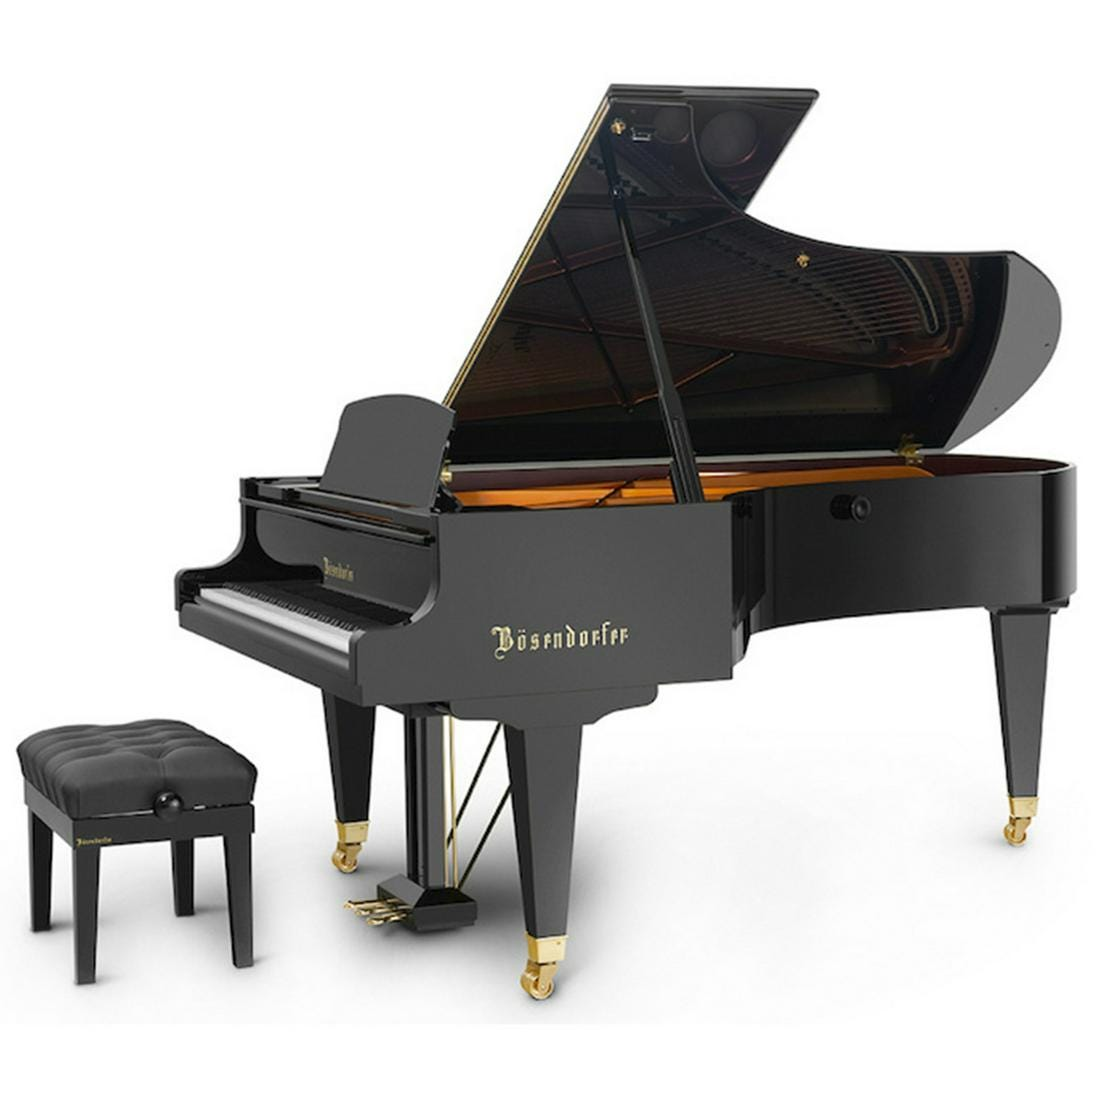 Bosendorfer grand piano (model 225, serial #37277)